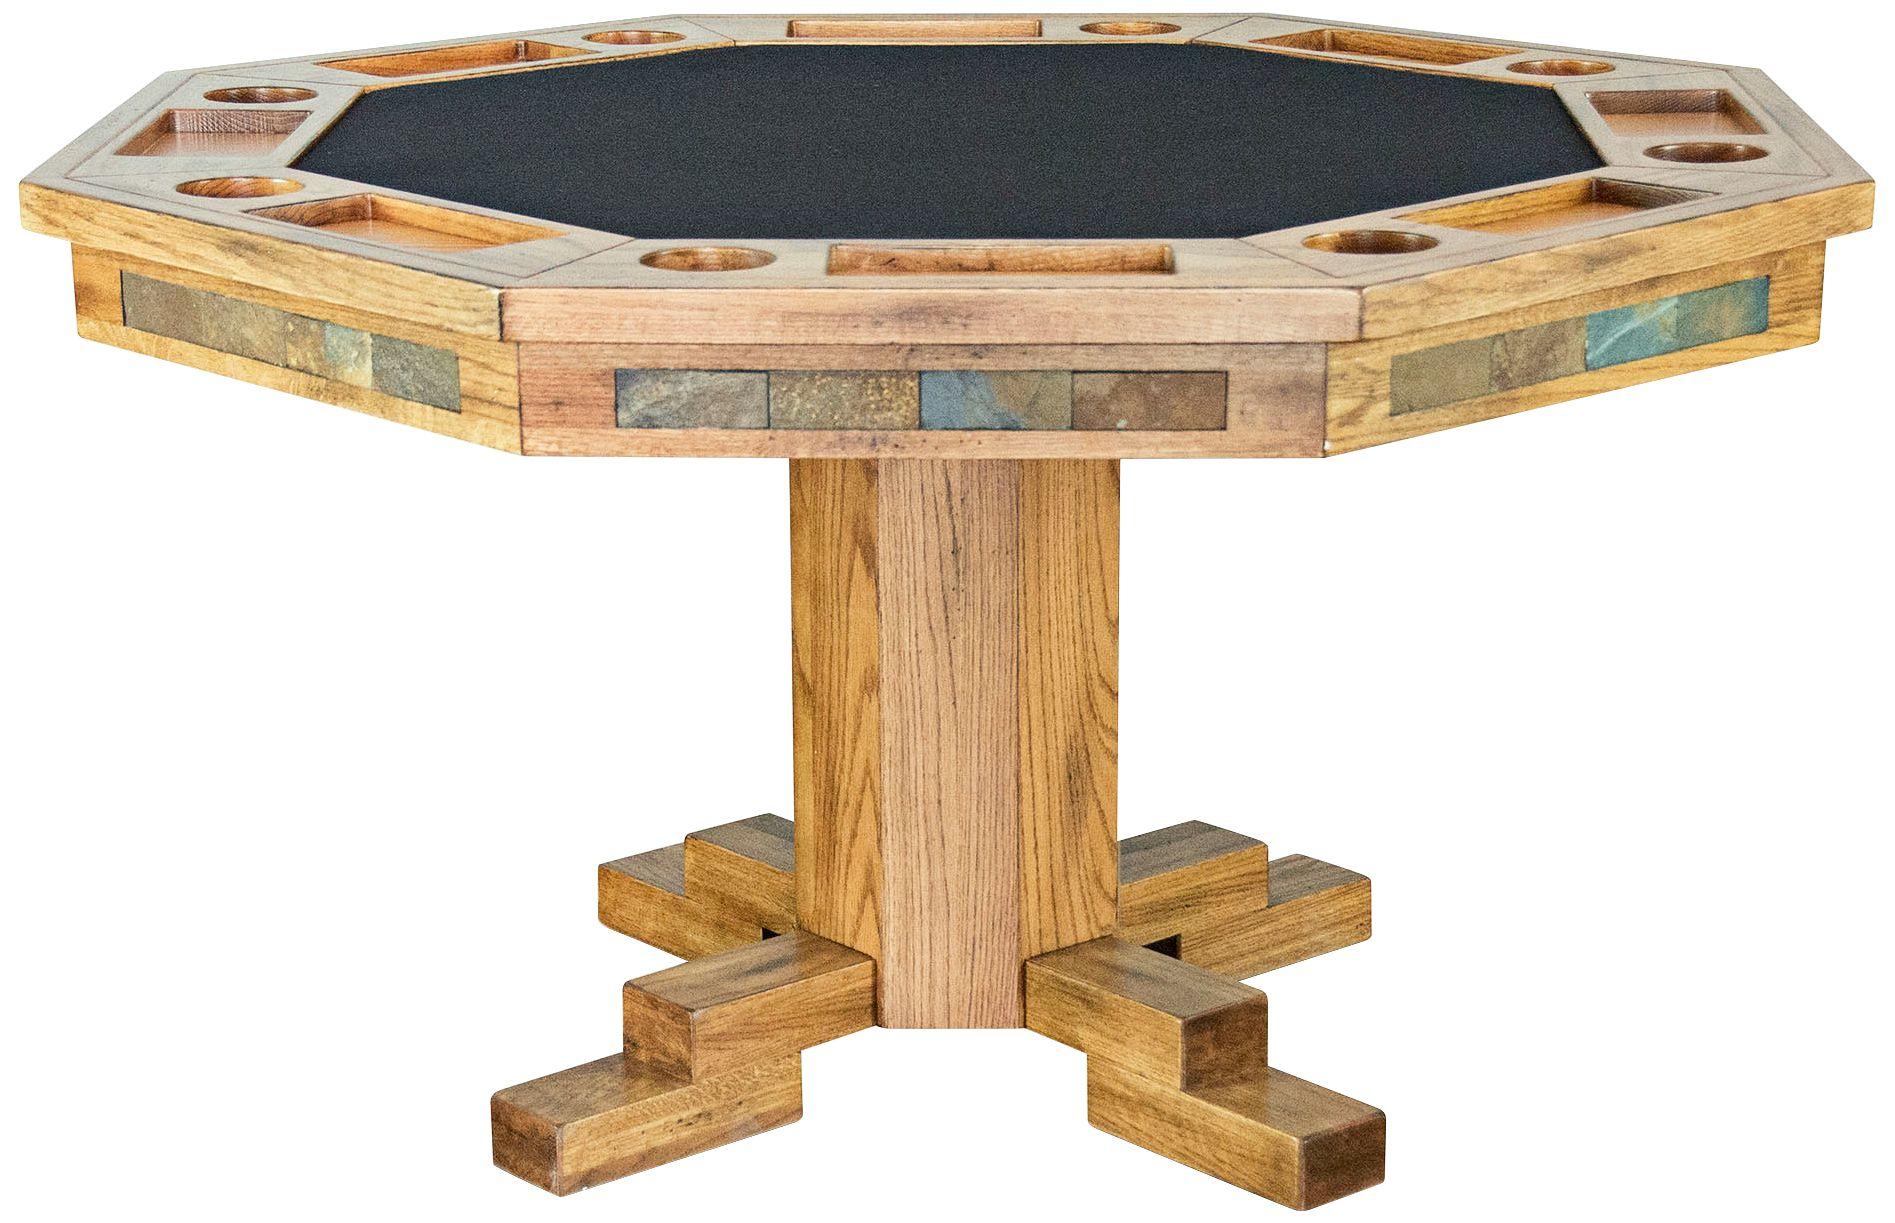 Sedona Rustic Oak Wood Game Table